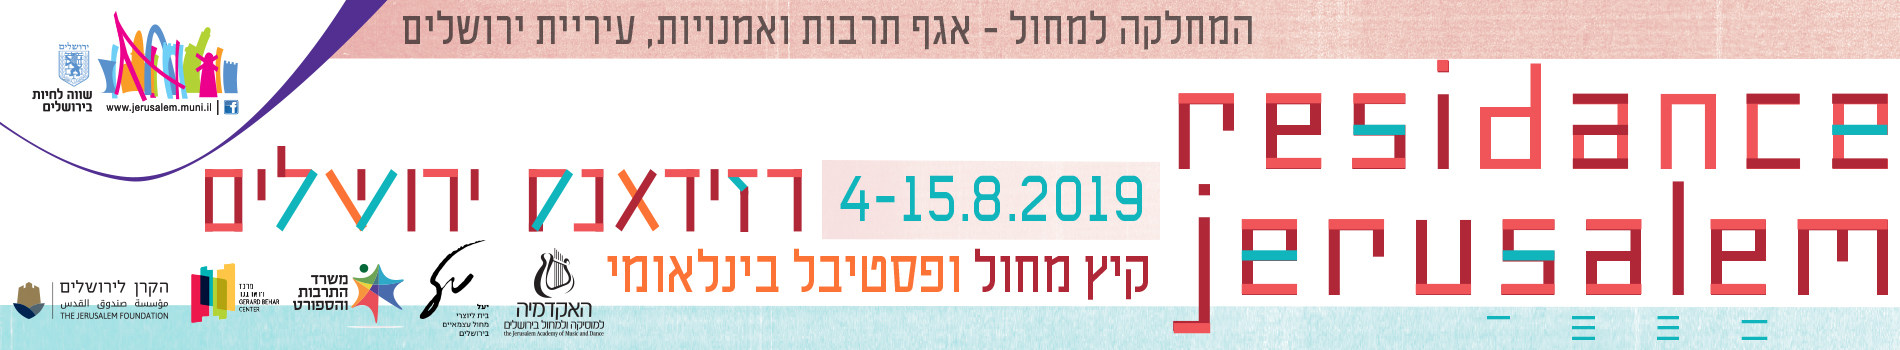 RESIDANCEJERUSALEM - קיץ מחול ופסטיבל בינלאומי לכוריאוגרפים ורקדנים